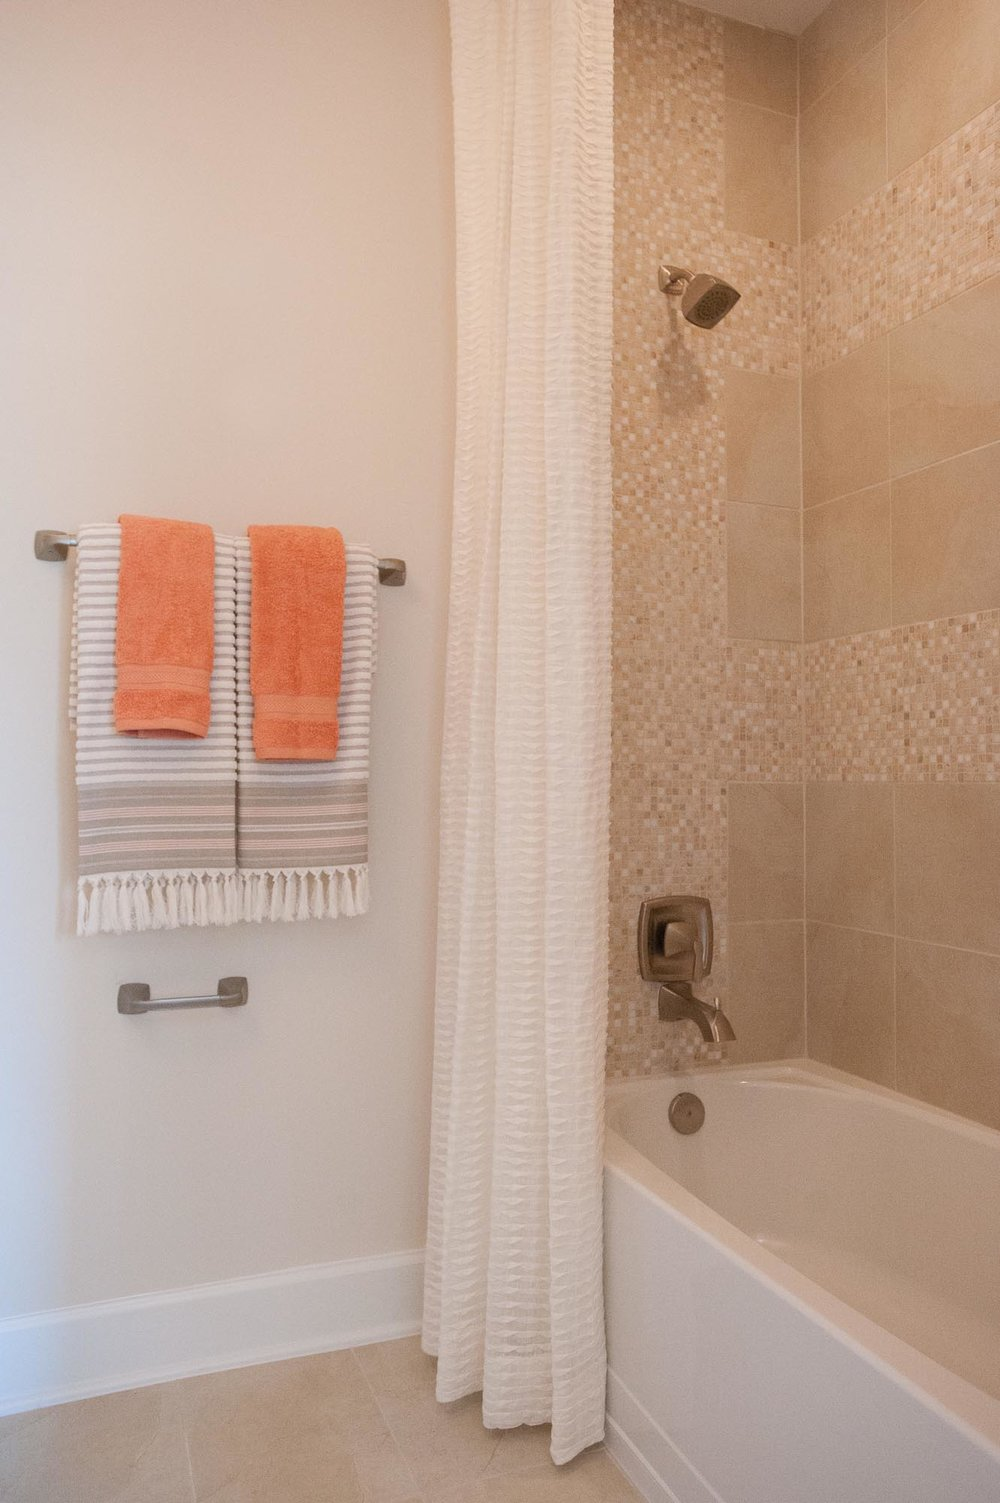 sterling-lennar-celestina-st johns-florida-nefba-northeast florida-southeastern united states-residential interior design-contemporary-bathroom-white cabinet-bathtub-shower-tile.jpg